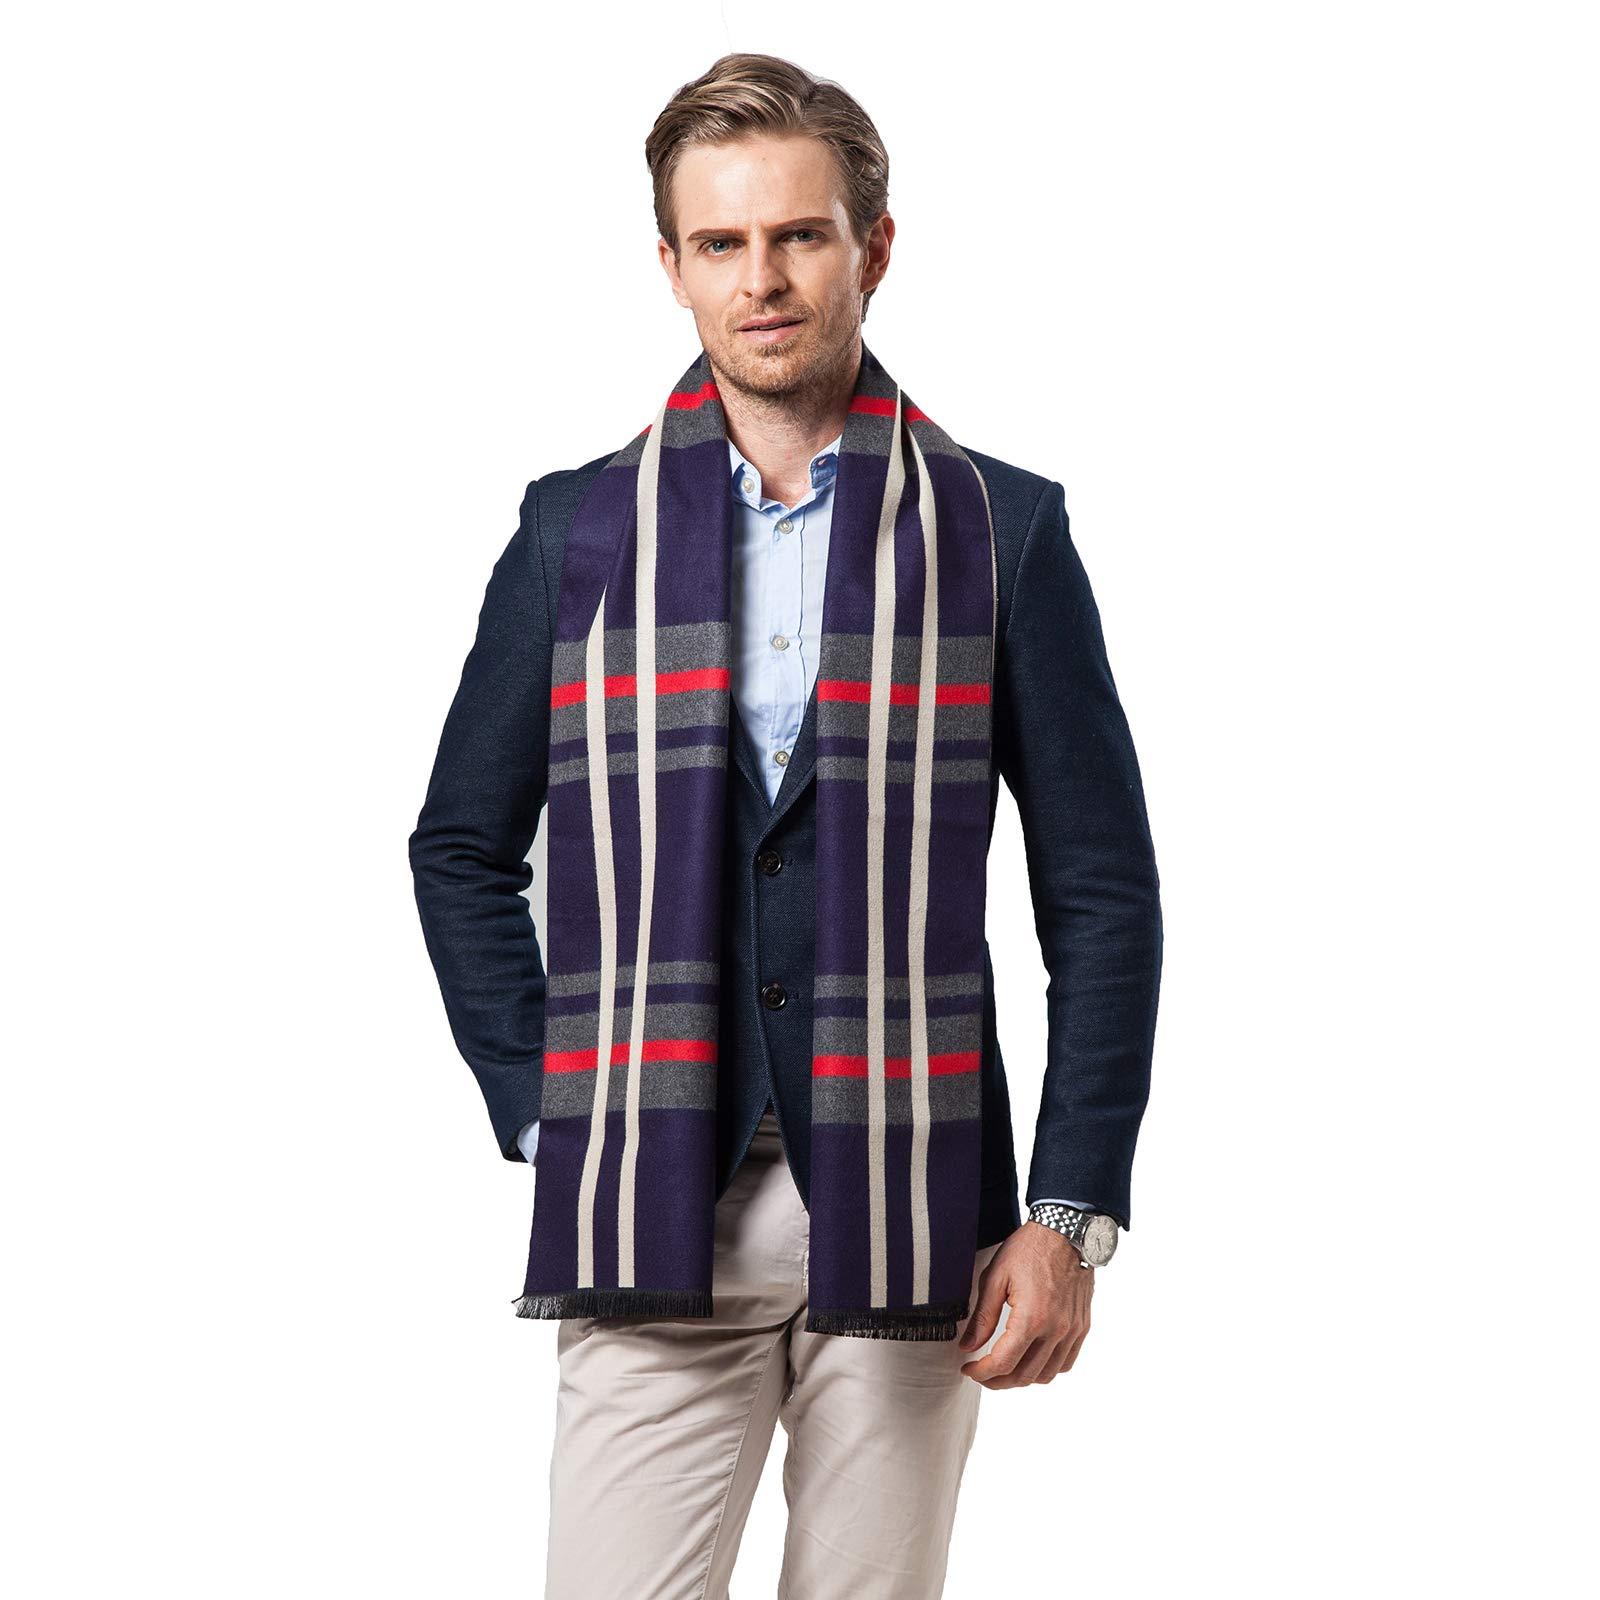 Men Winter Cashmere Scarf Soft Warm Neckwear Fashion Designer Shawl Bussiness Casual Scarves (Navy Lattices)